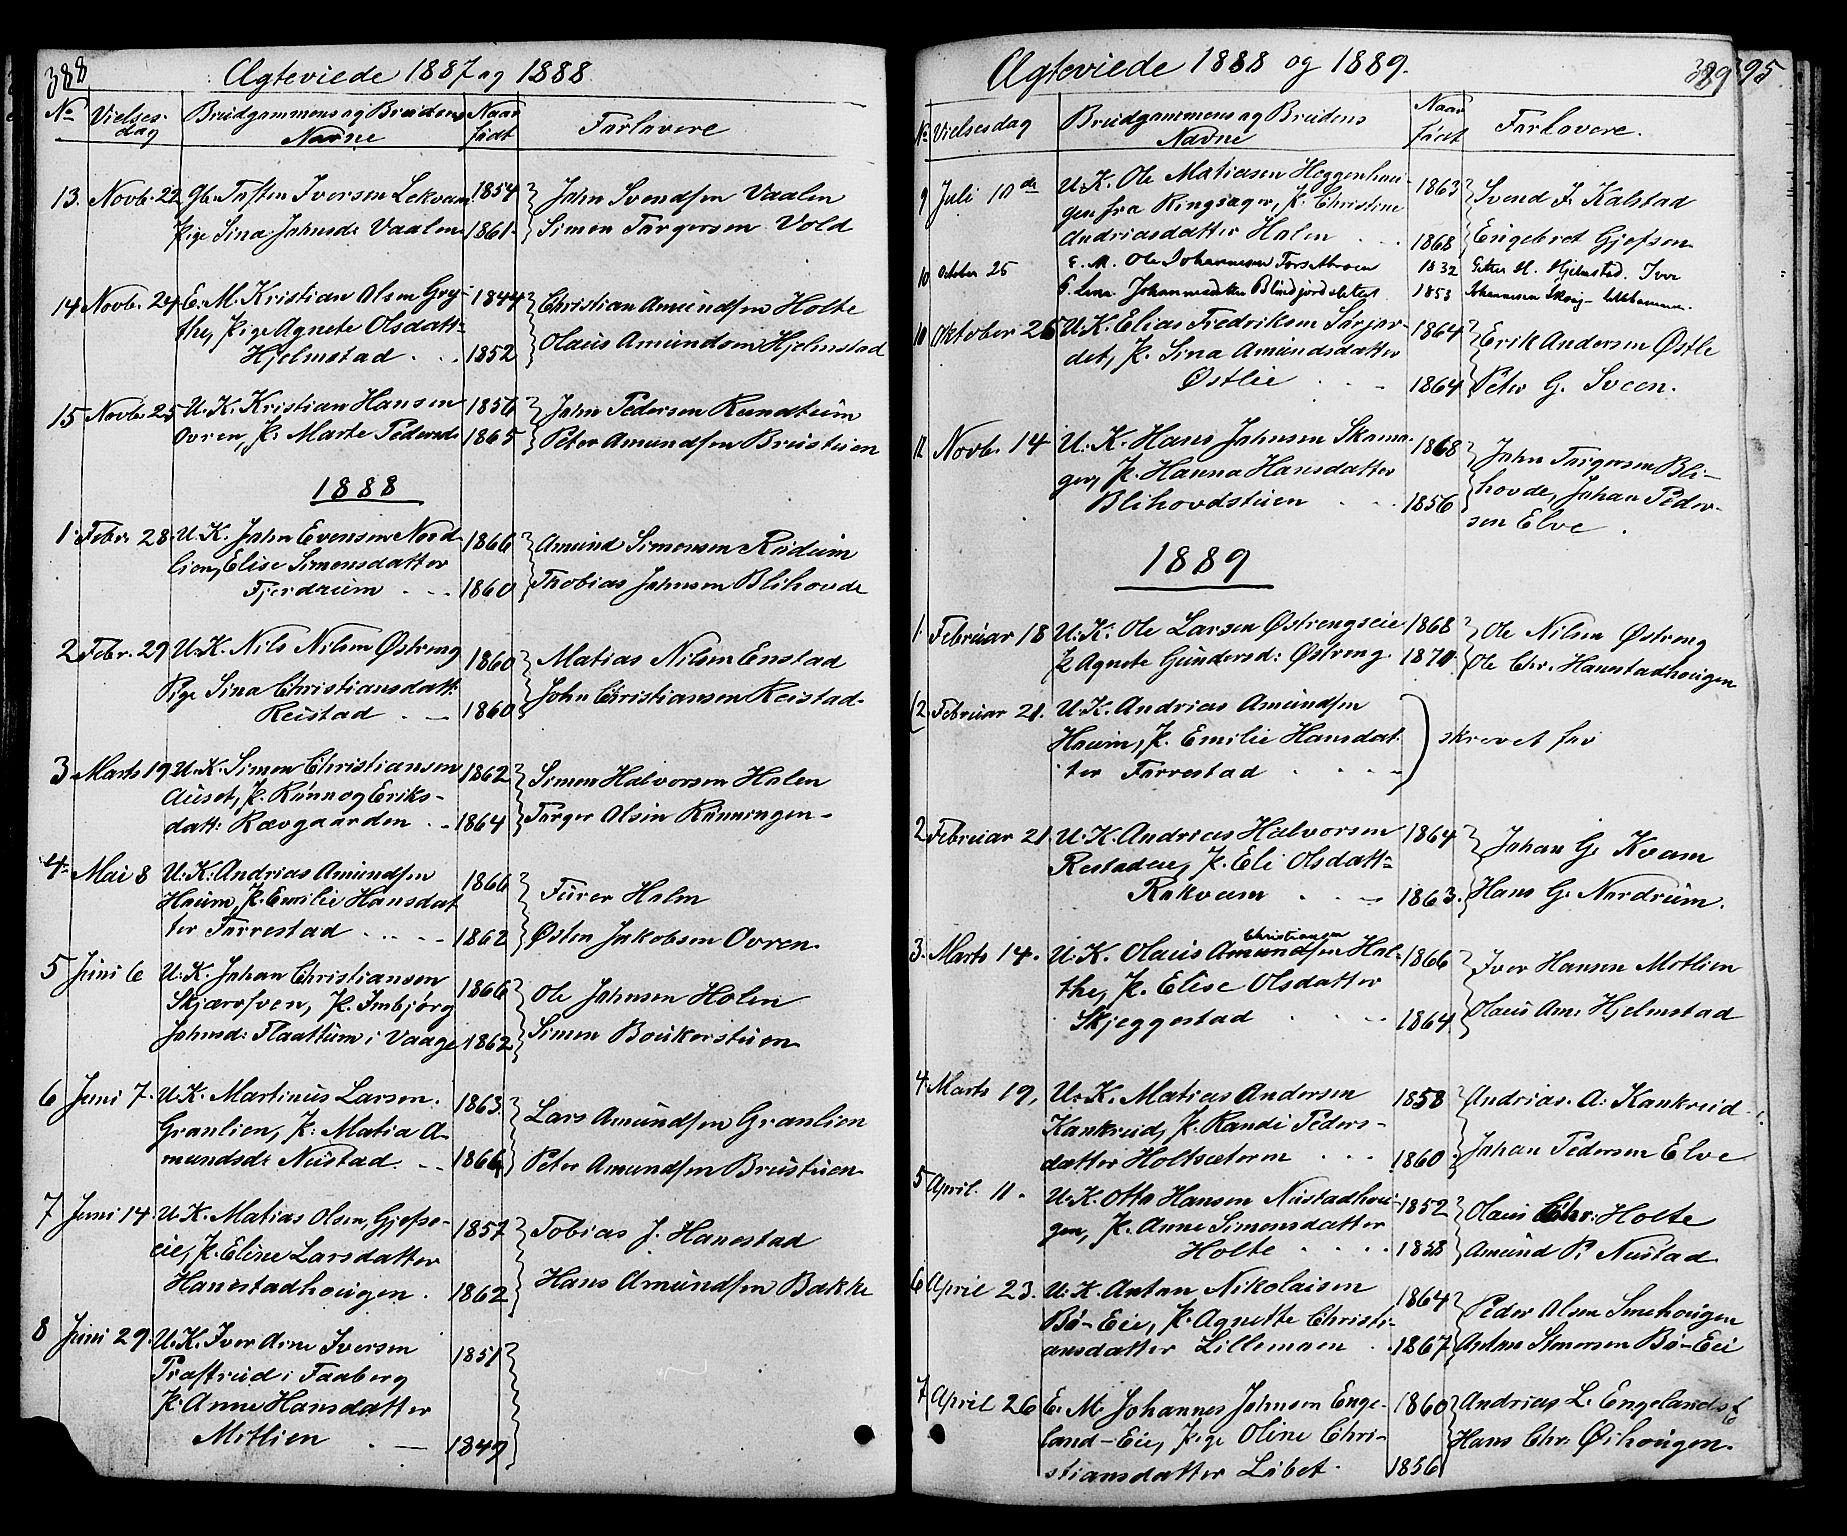 SAH, Østre Gausdal prestekontor, Klokkerbok nr. 1, 1863-1893, s. 388-389